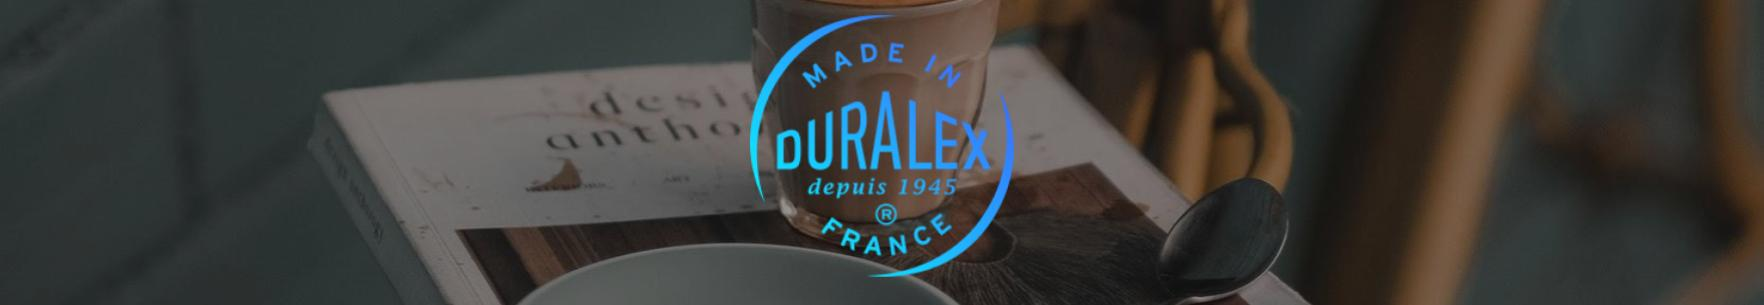 Kaffeglas fra Duralex